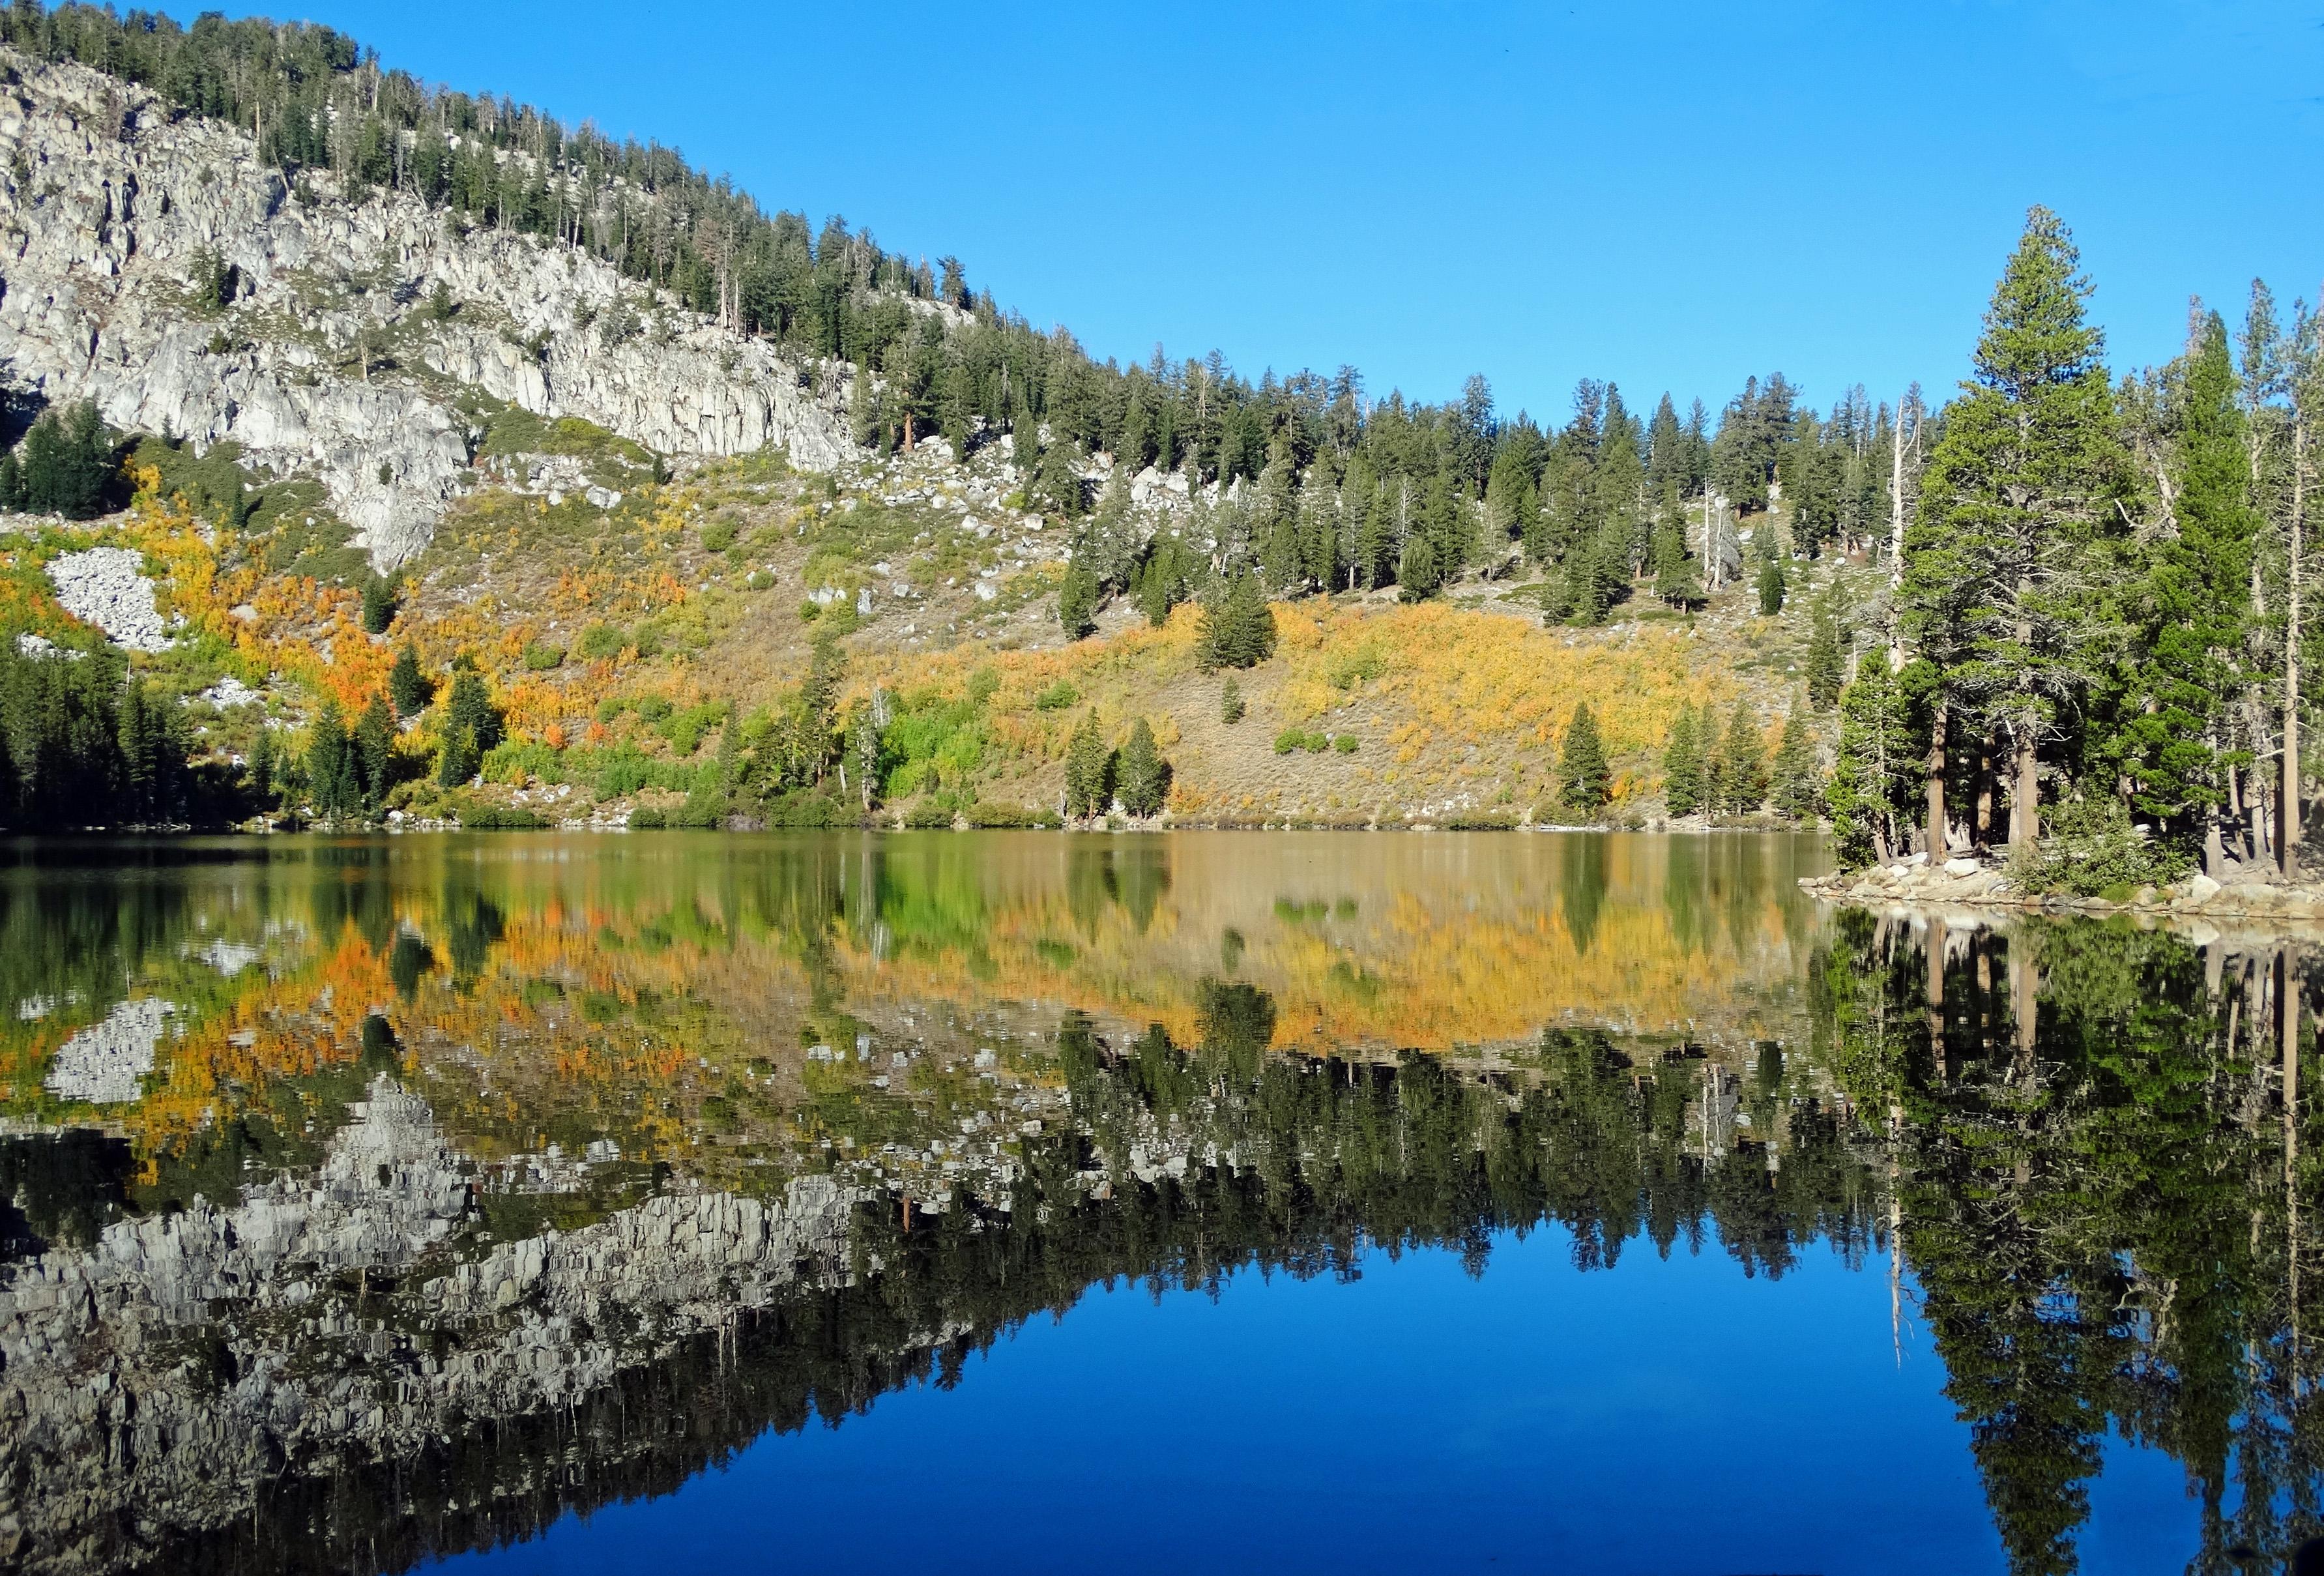 Autumn Reflections, Lake George, CA 9-16